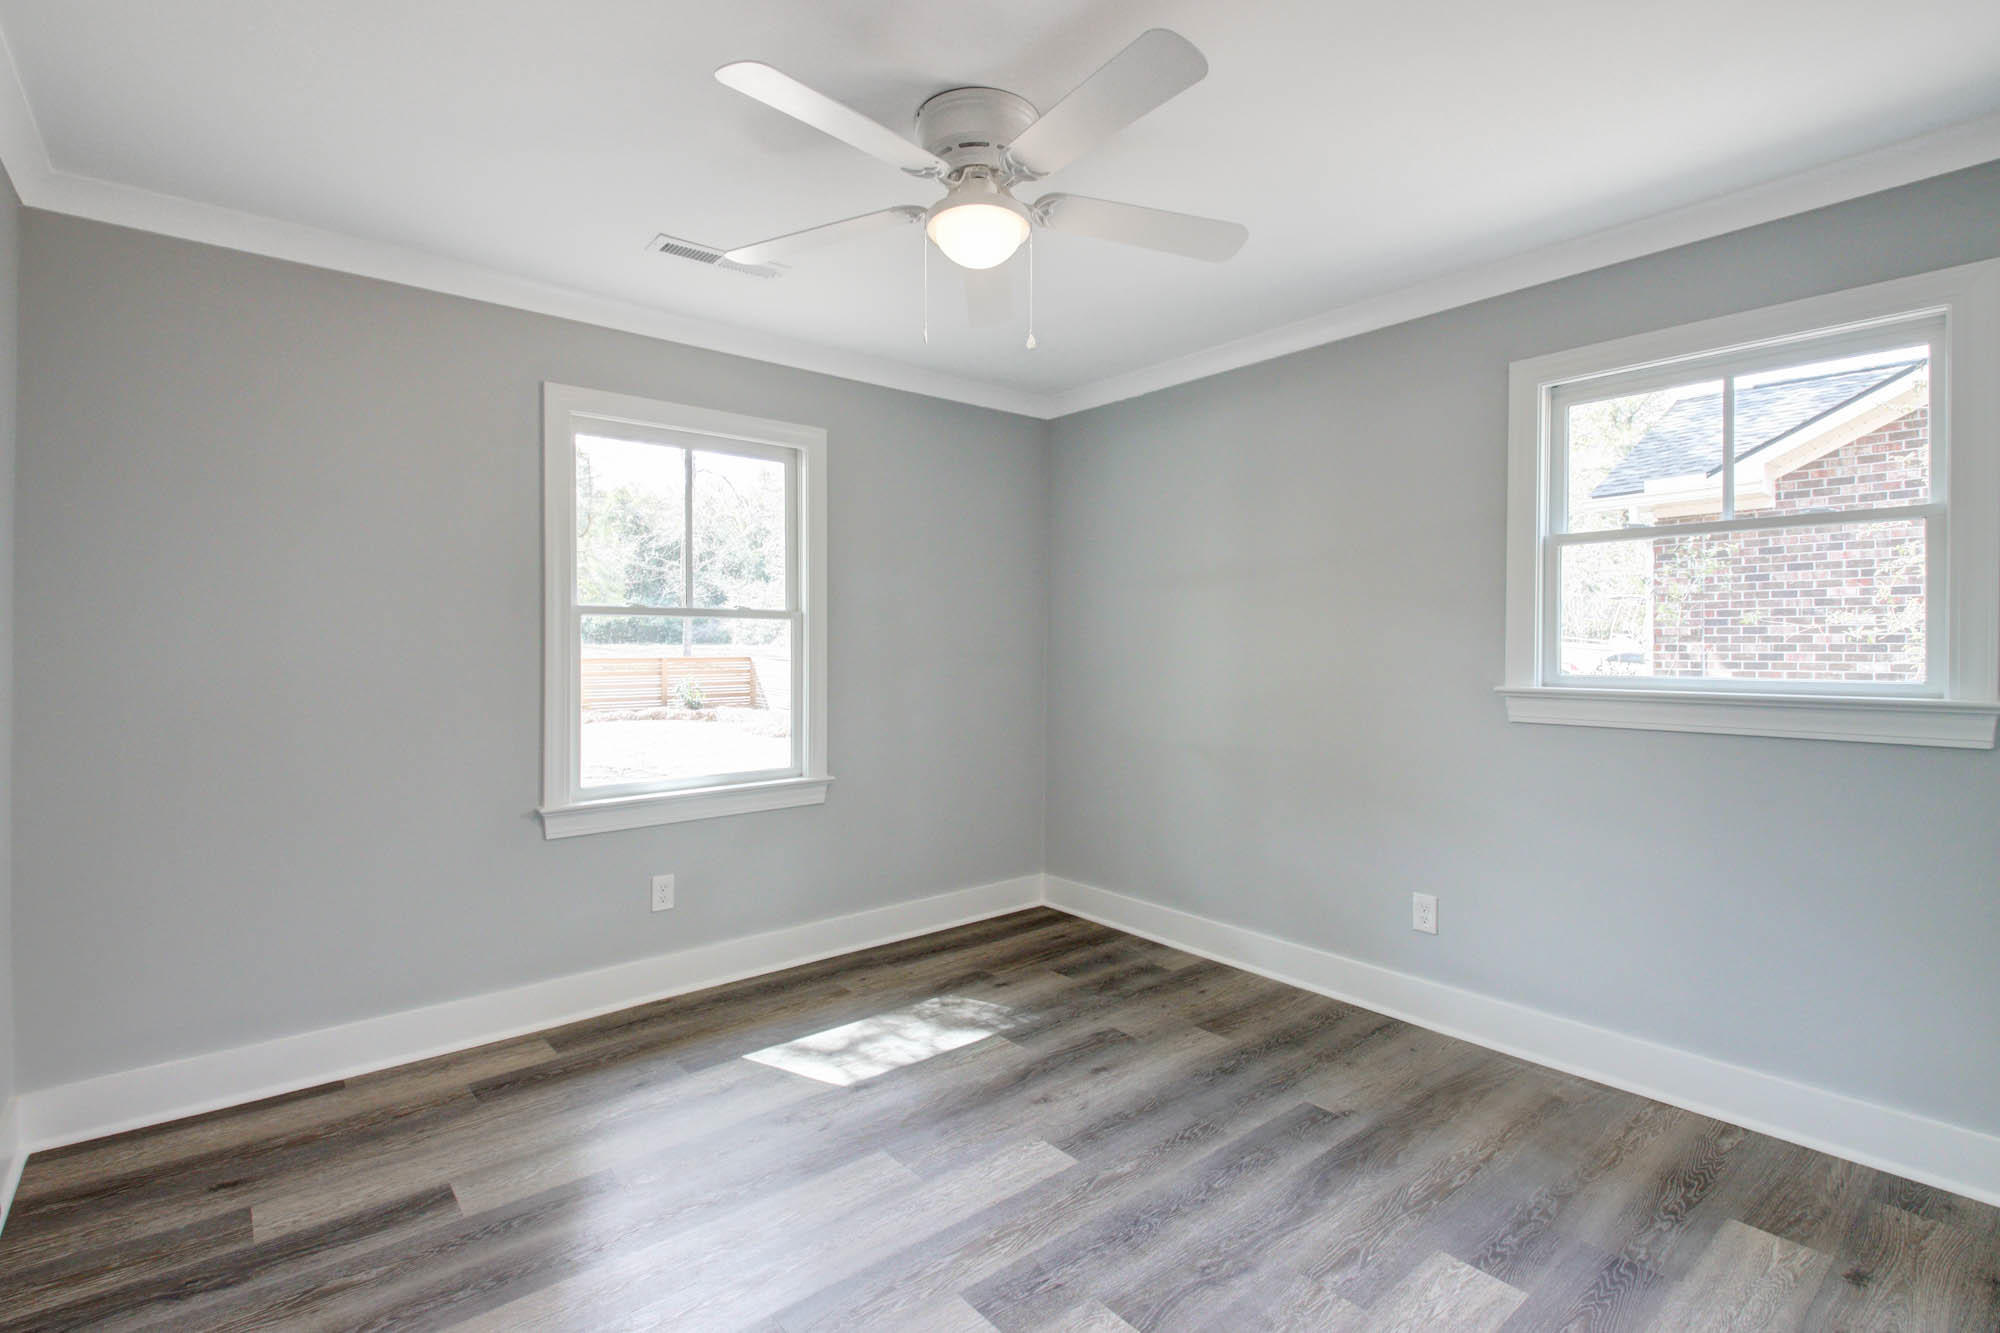 Scanlonville Homes For Sale - 344 4th, Mount Pleasant, SC - 25